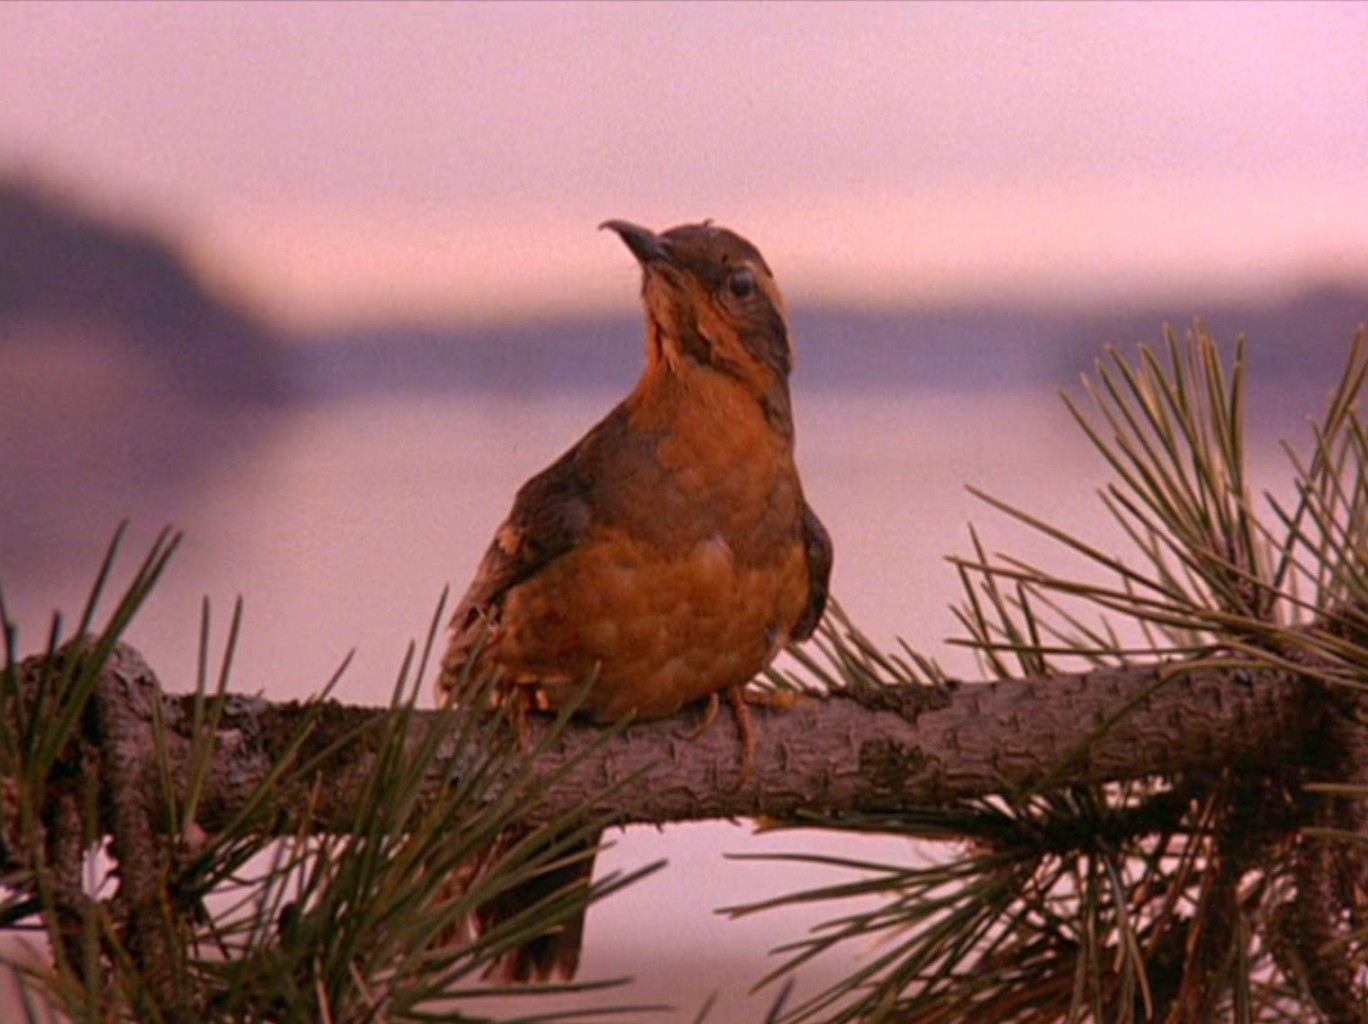 Twin Peaks bird